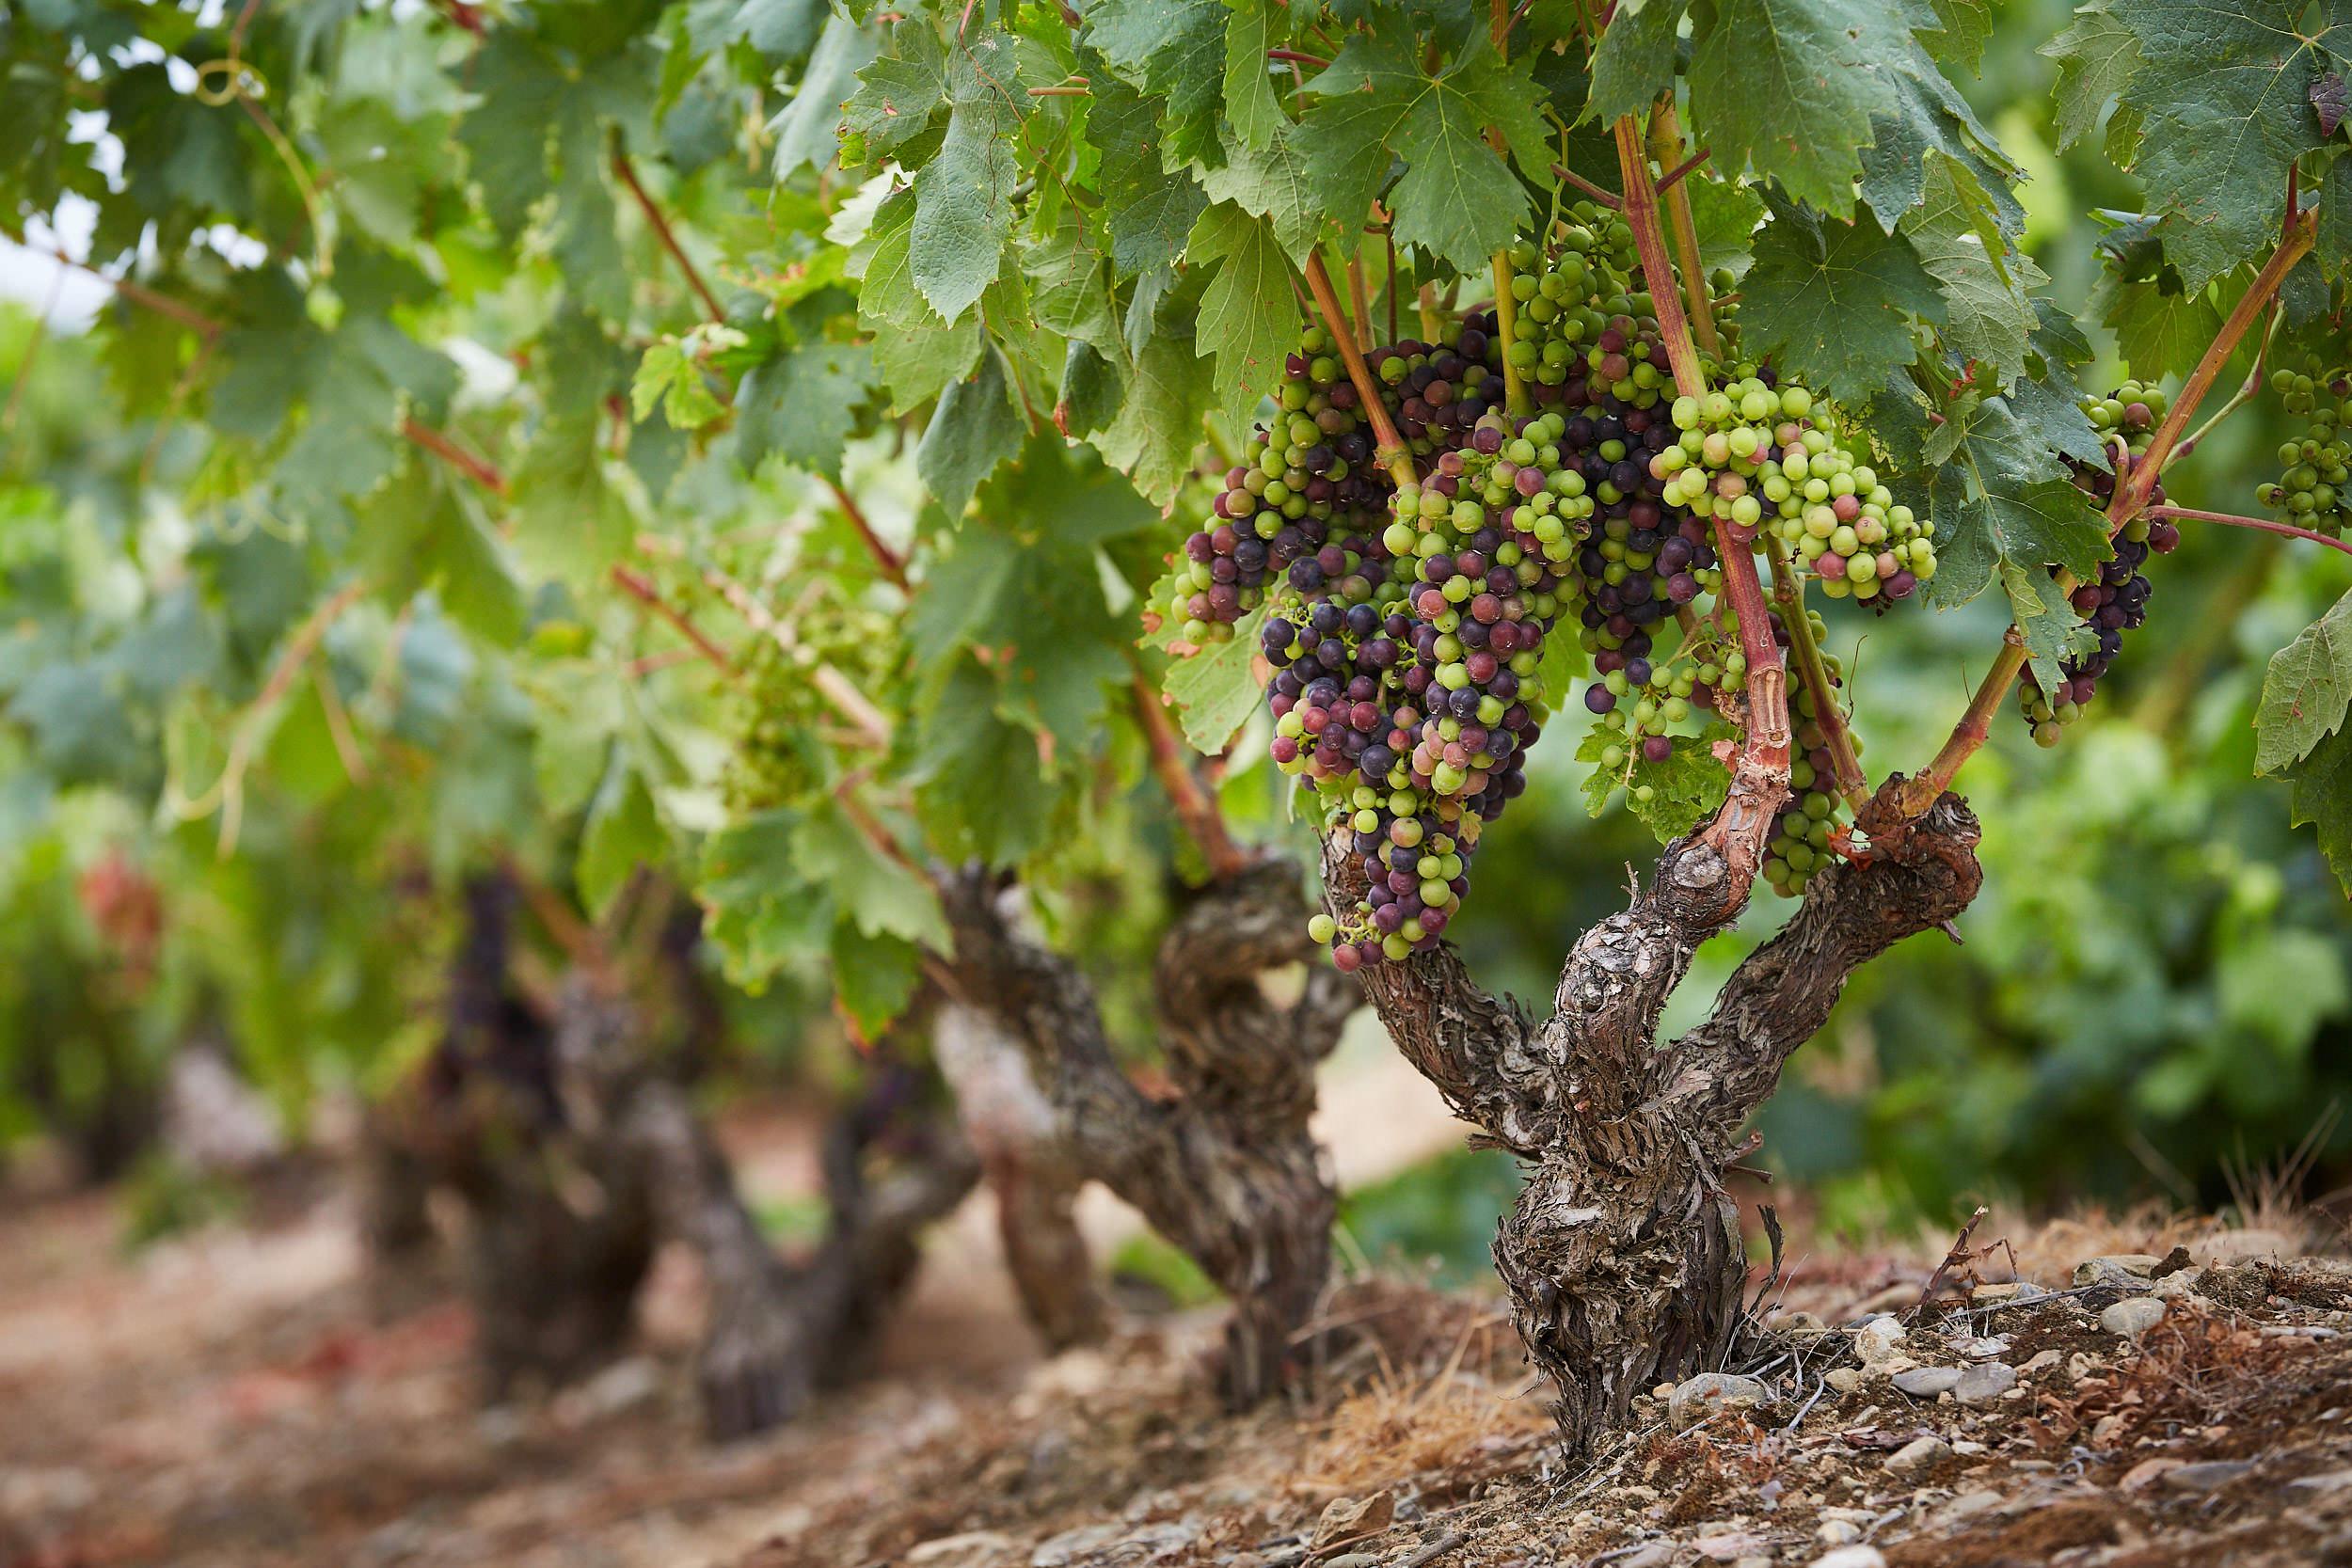 1808fotografia-profesional-corporativa-vino-rioja-espana-James-Sturcke_0035.jpg